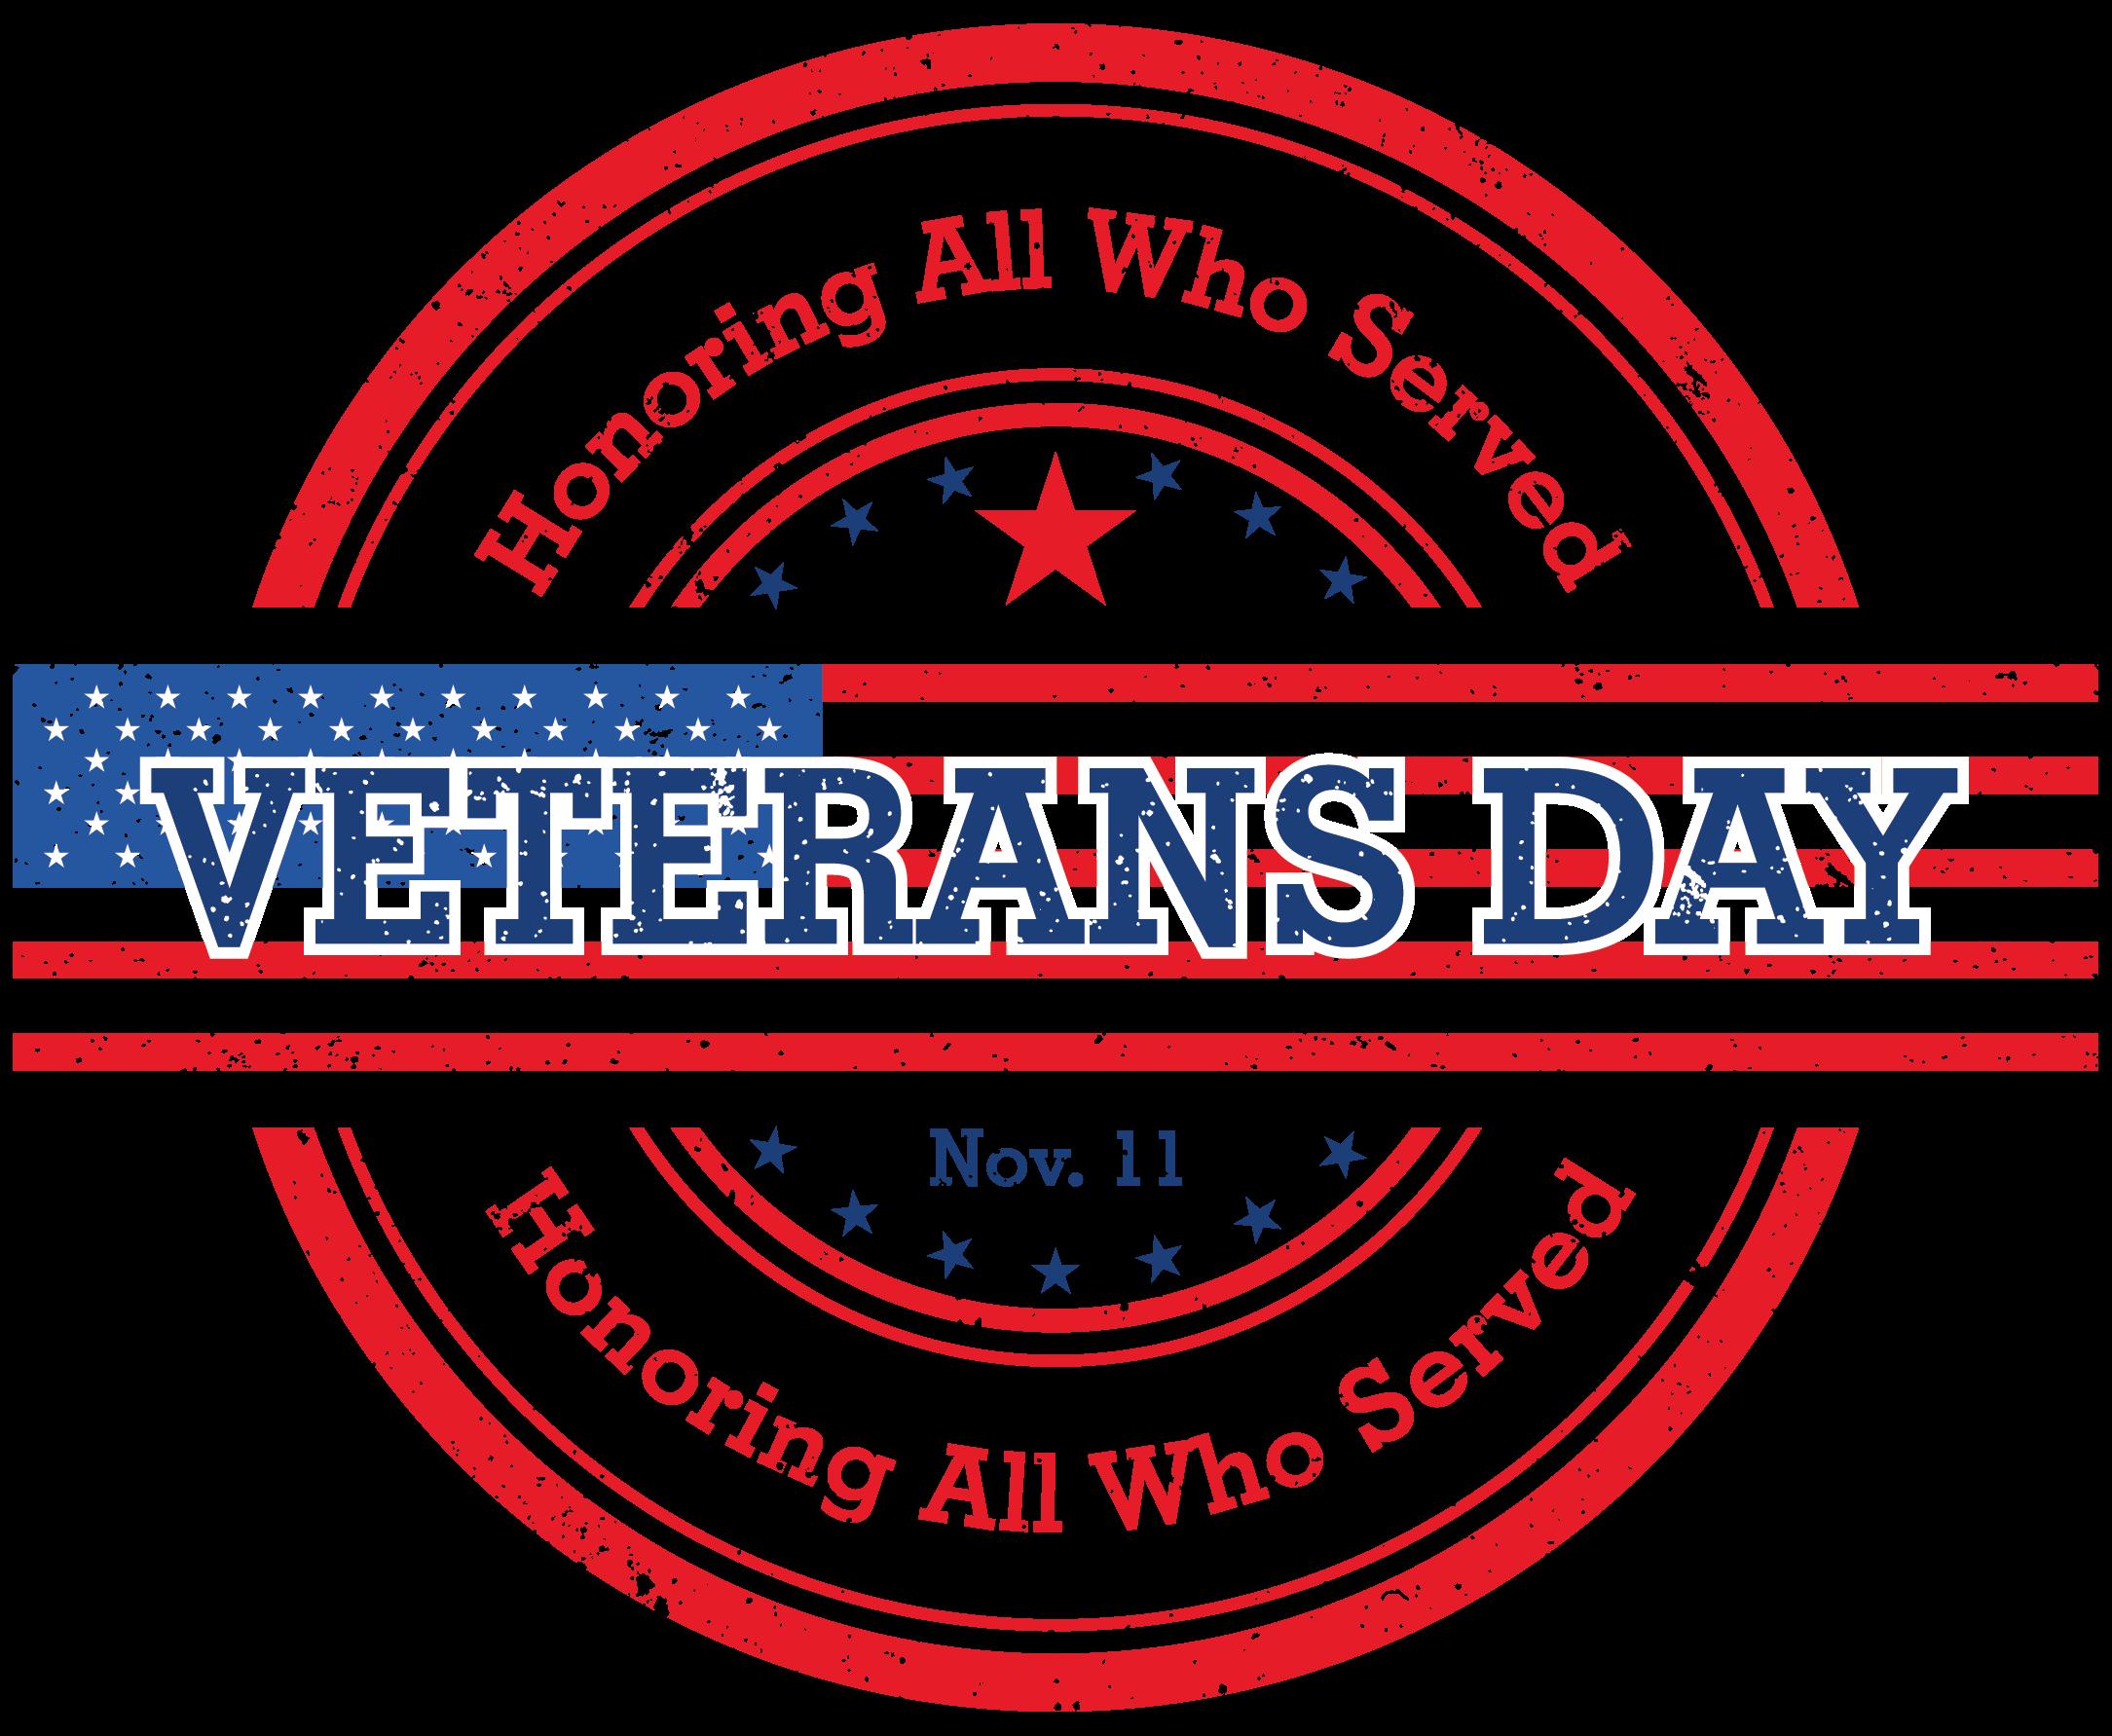 Png transparent images pluspng. Parade clipart veterans day